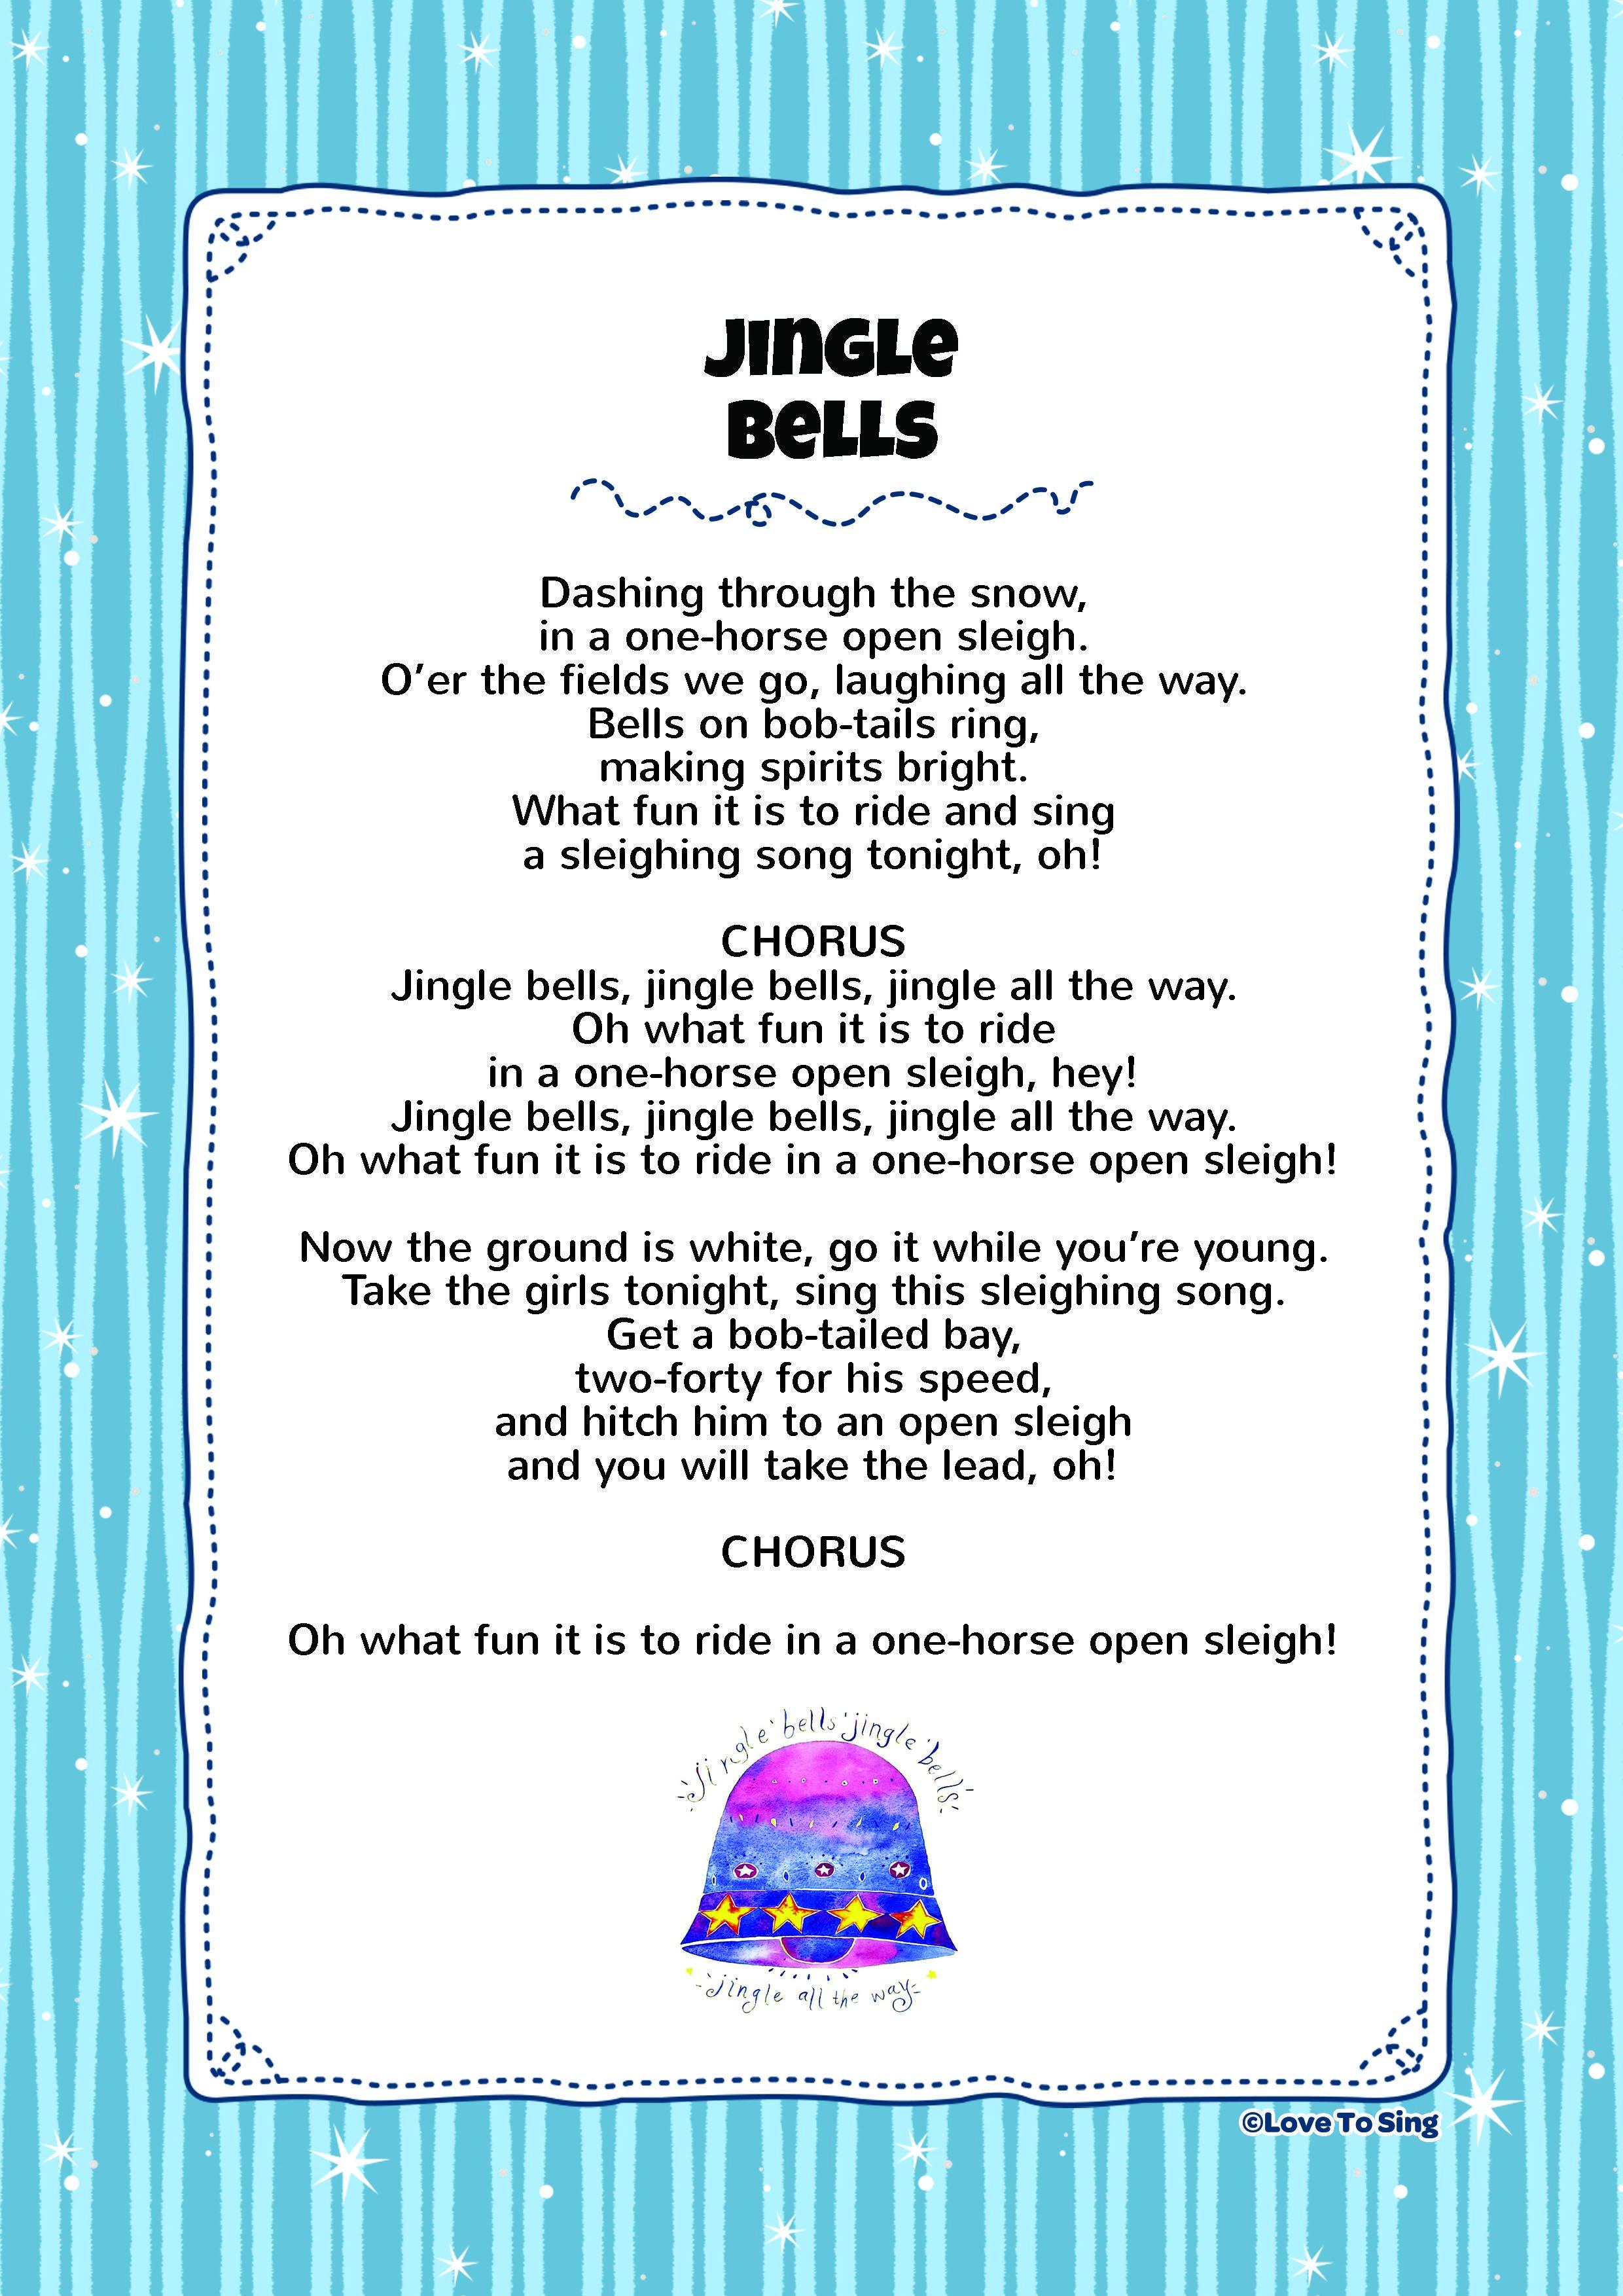 Jingle Bells | Christmas Song Lyrics | Kids video songs, Christmas songs for kids, Christmas ...